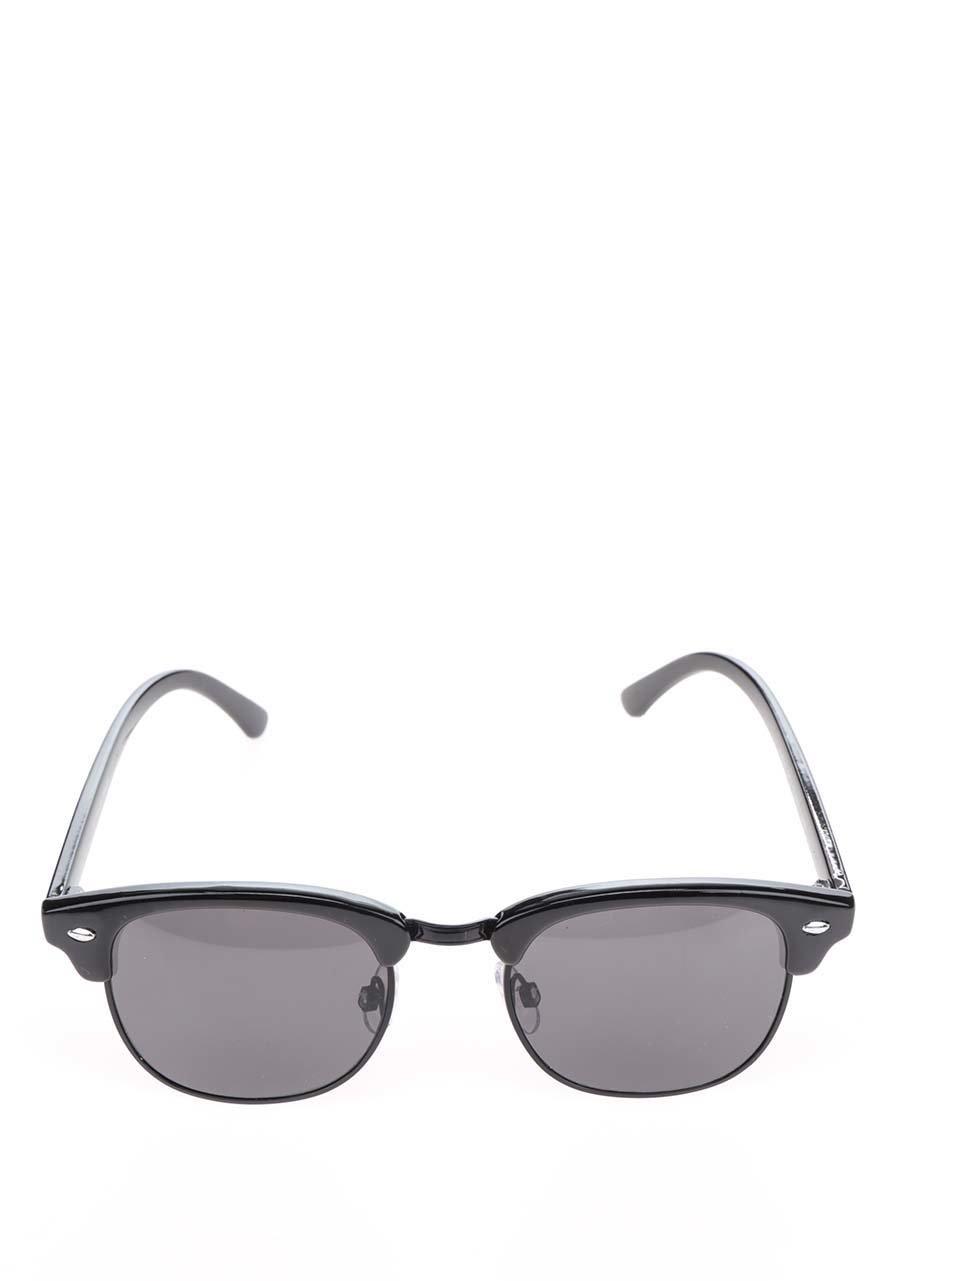 cc2a44d68 Čierne slnečné okuliare ONLY & SONS Clubmaster | ZOOT.sk